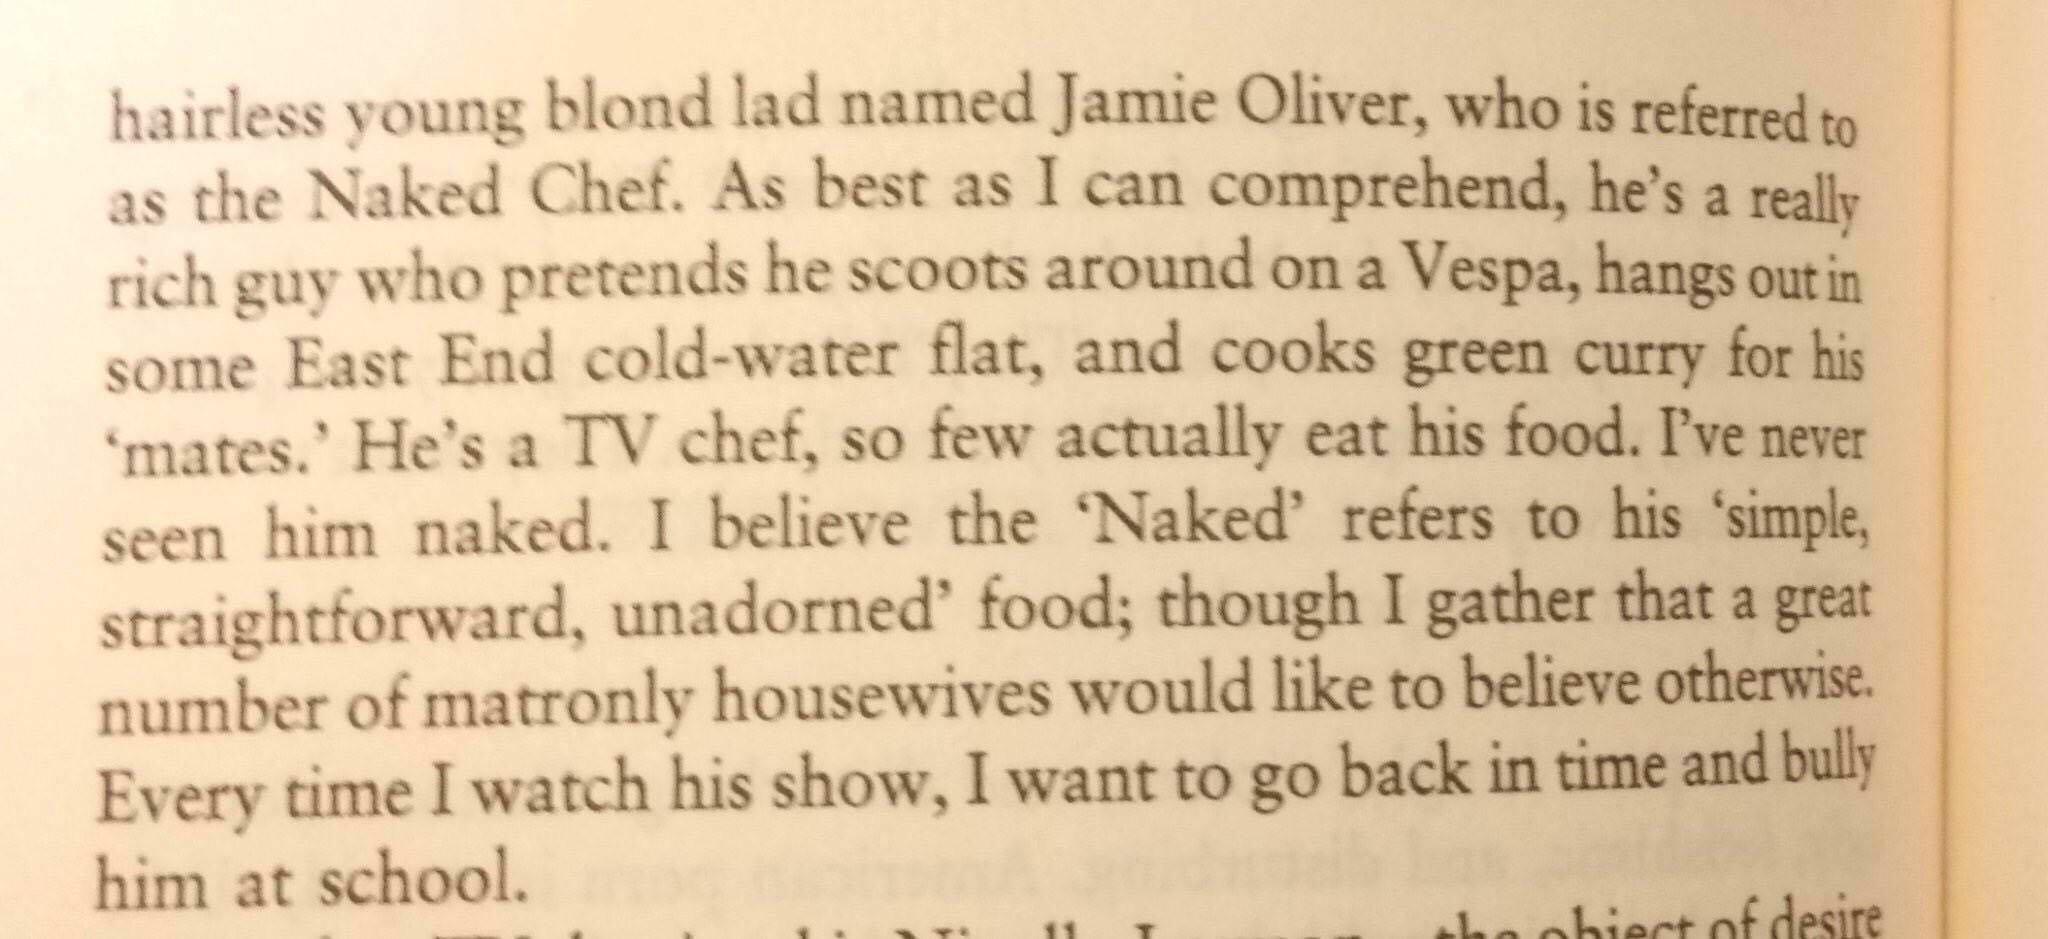 Anthony Bourdain on Jamie Oliver